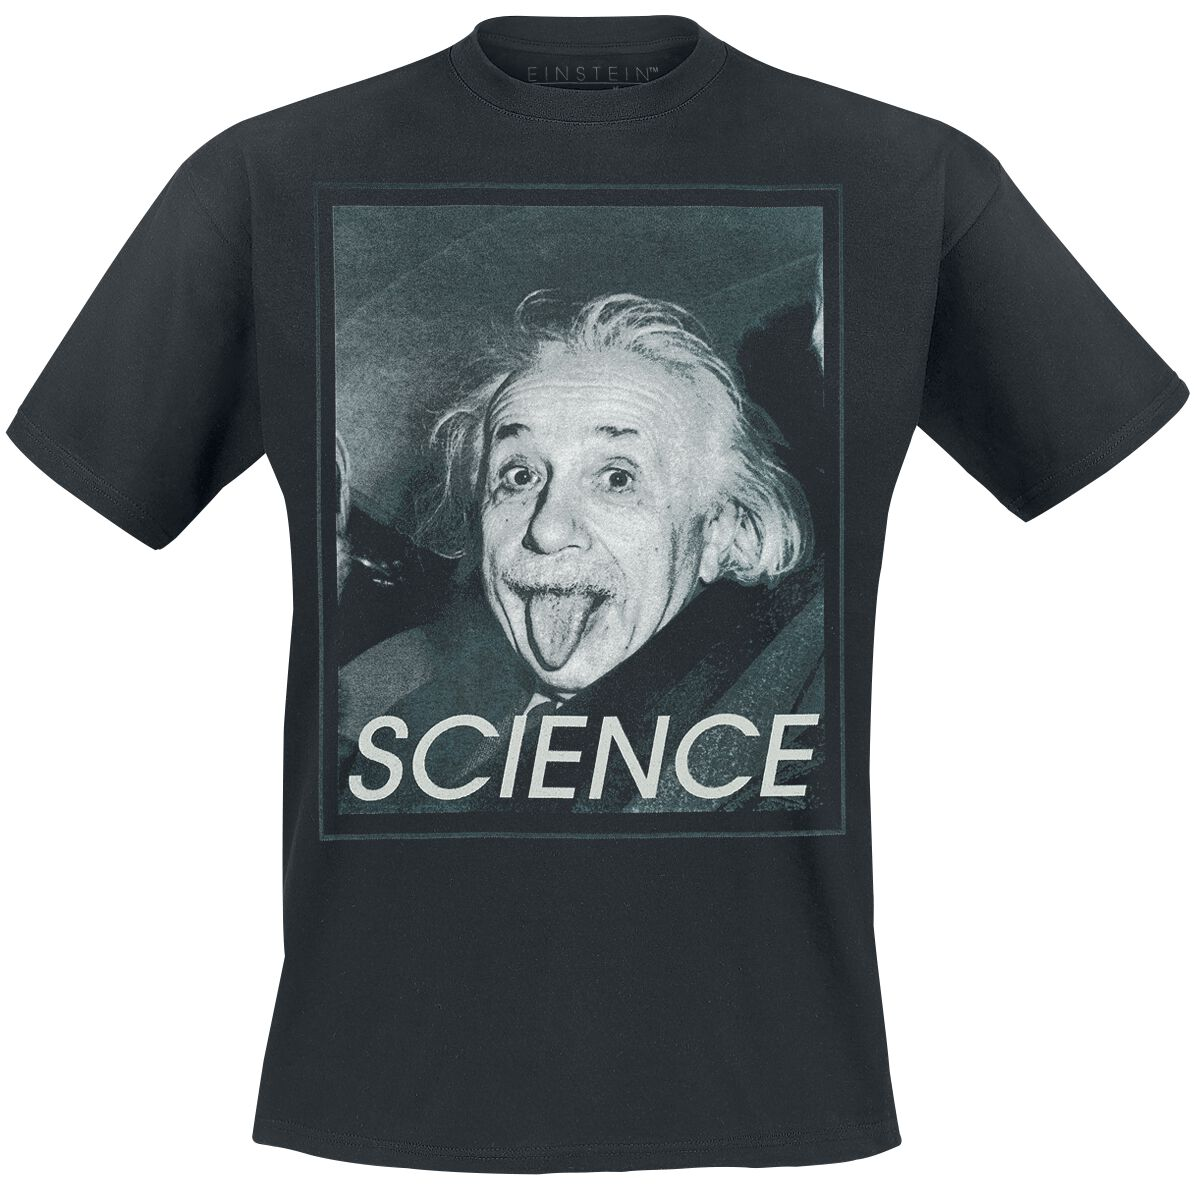 Merch dla Fanów - Koszulki - T-Shirt Albert Einstein Science T-Shirt czarny - 357190